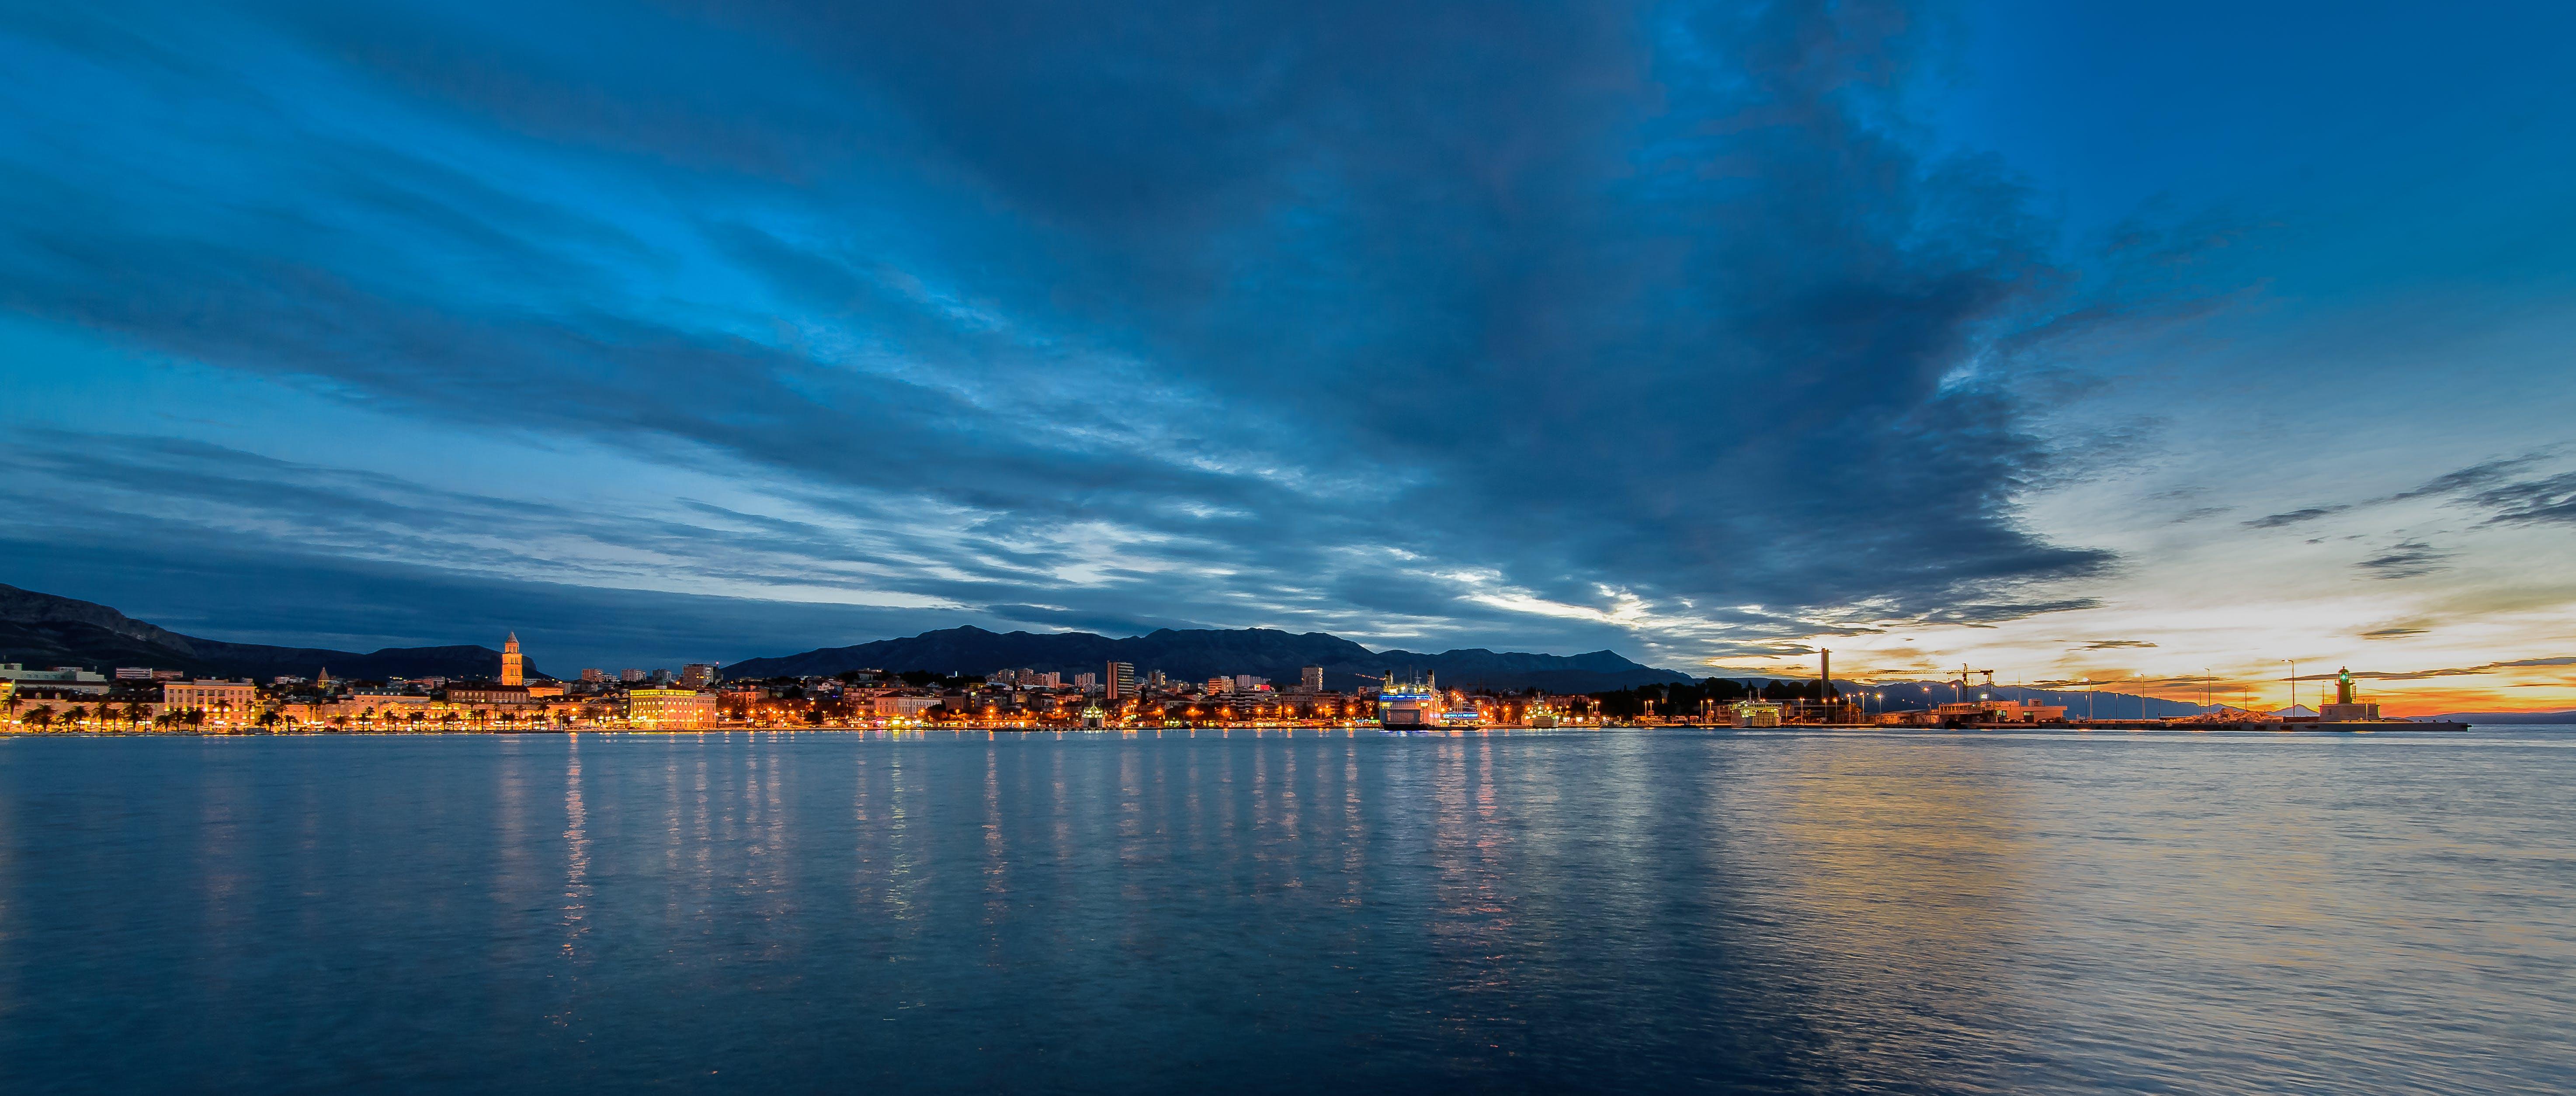 Free stock photo of sunrise, seaside, bluehour, adriatic sea